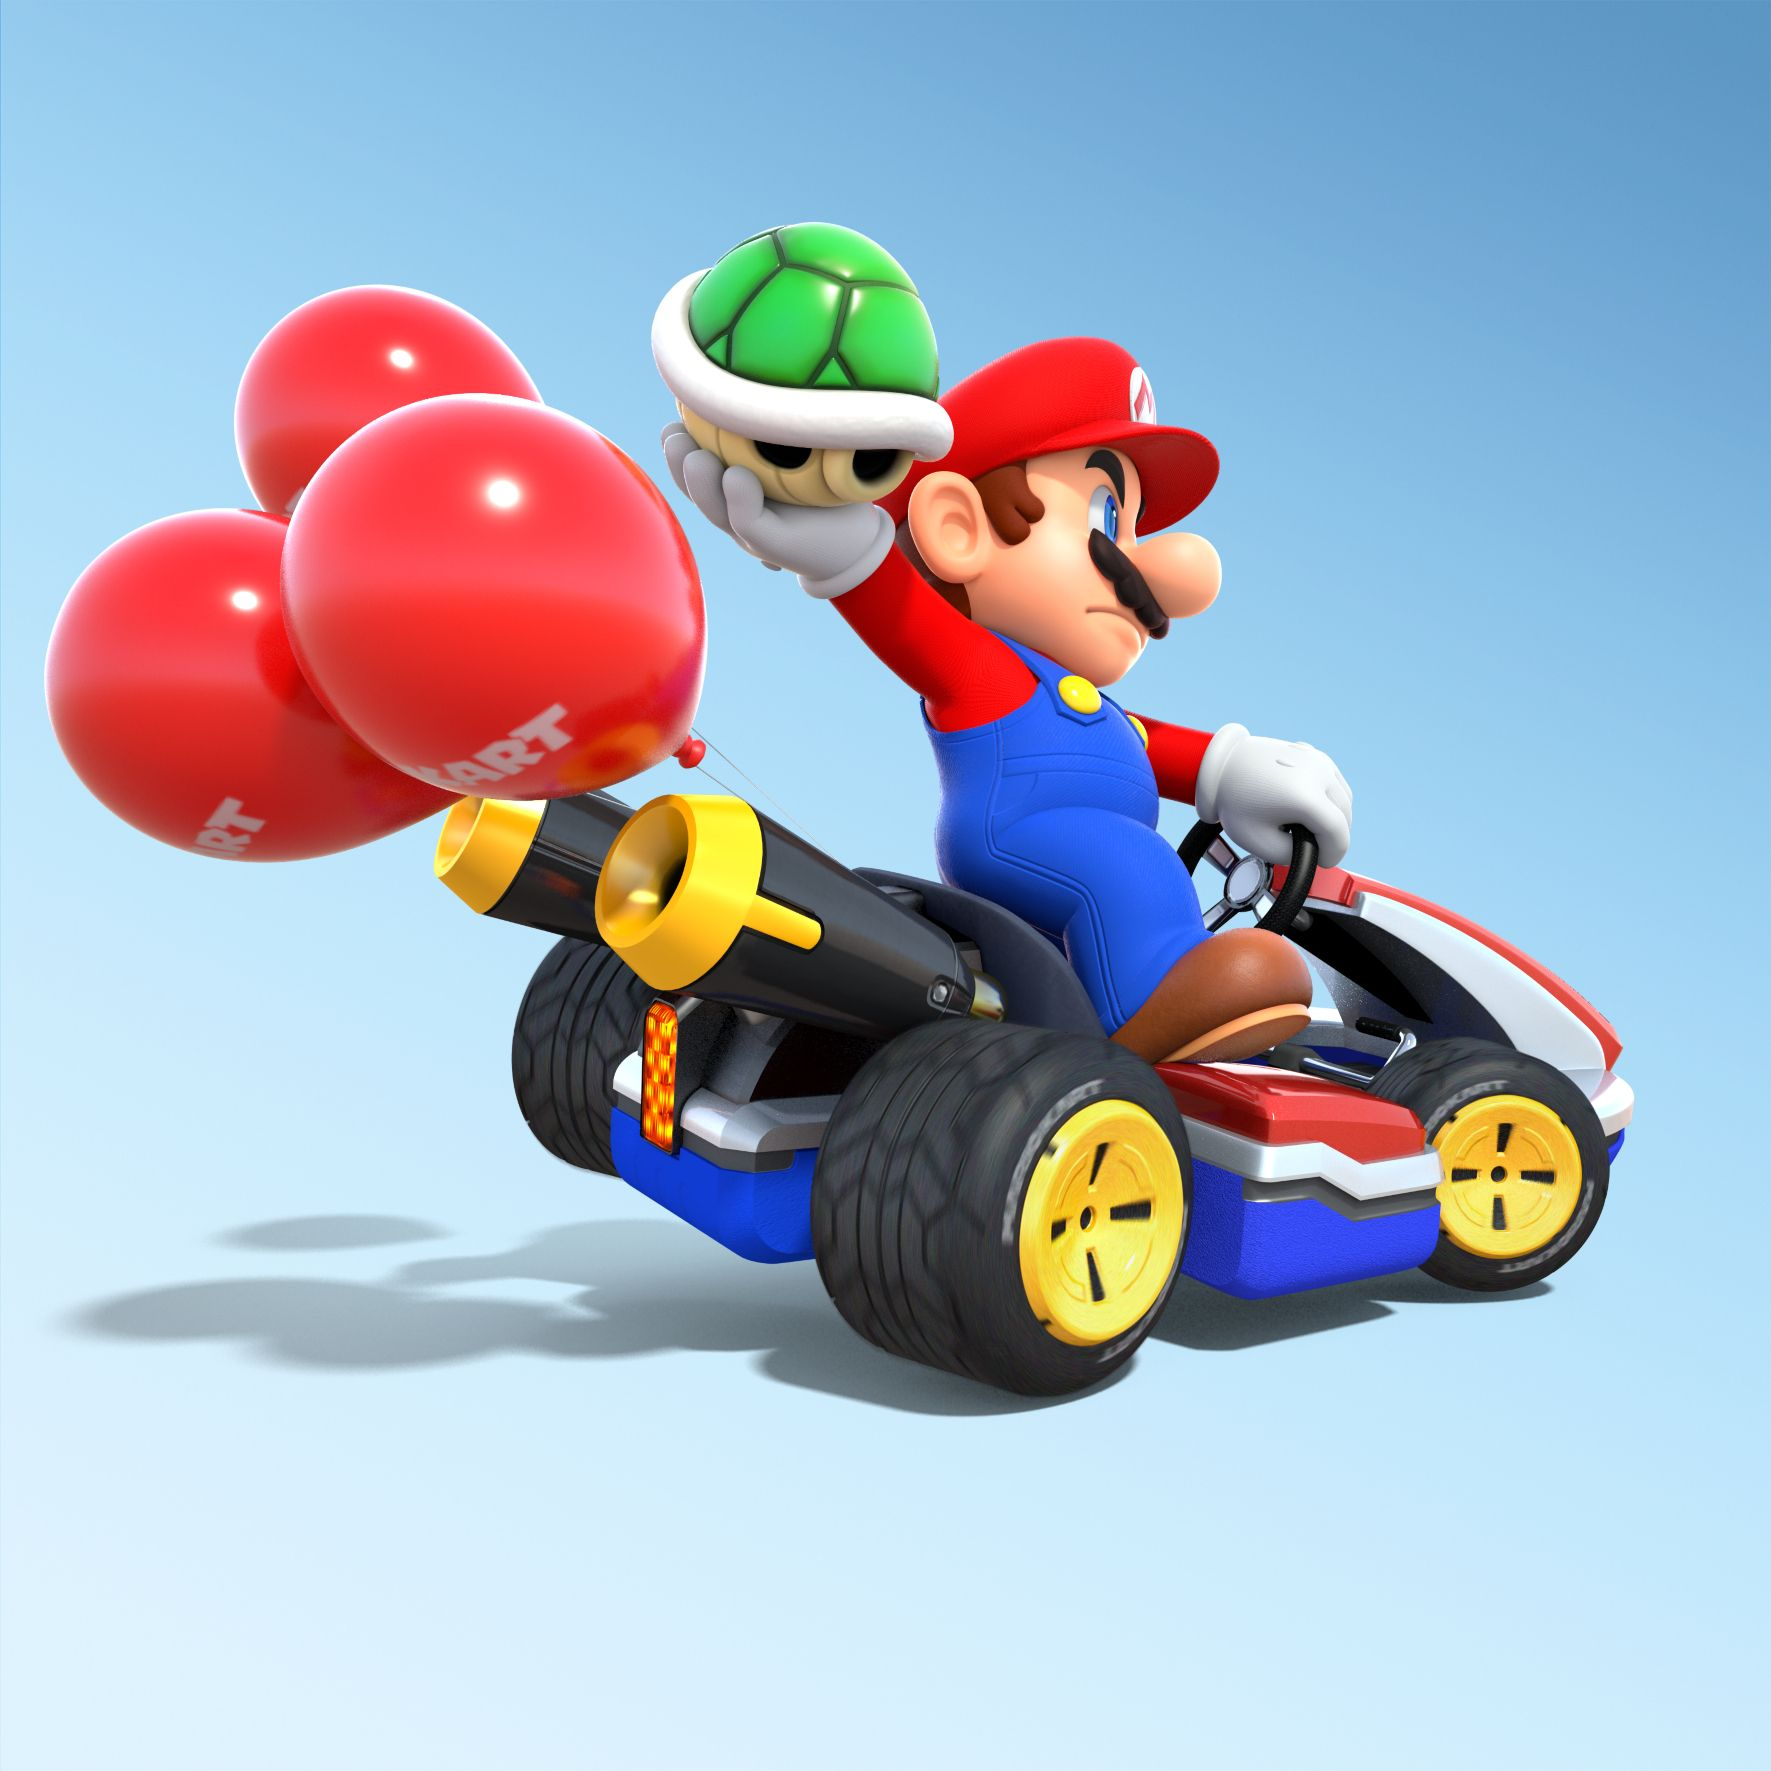 Mario Kart 8 Deluxe Hd Artwork Mario Kart Mario Kart 8 Mario